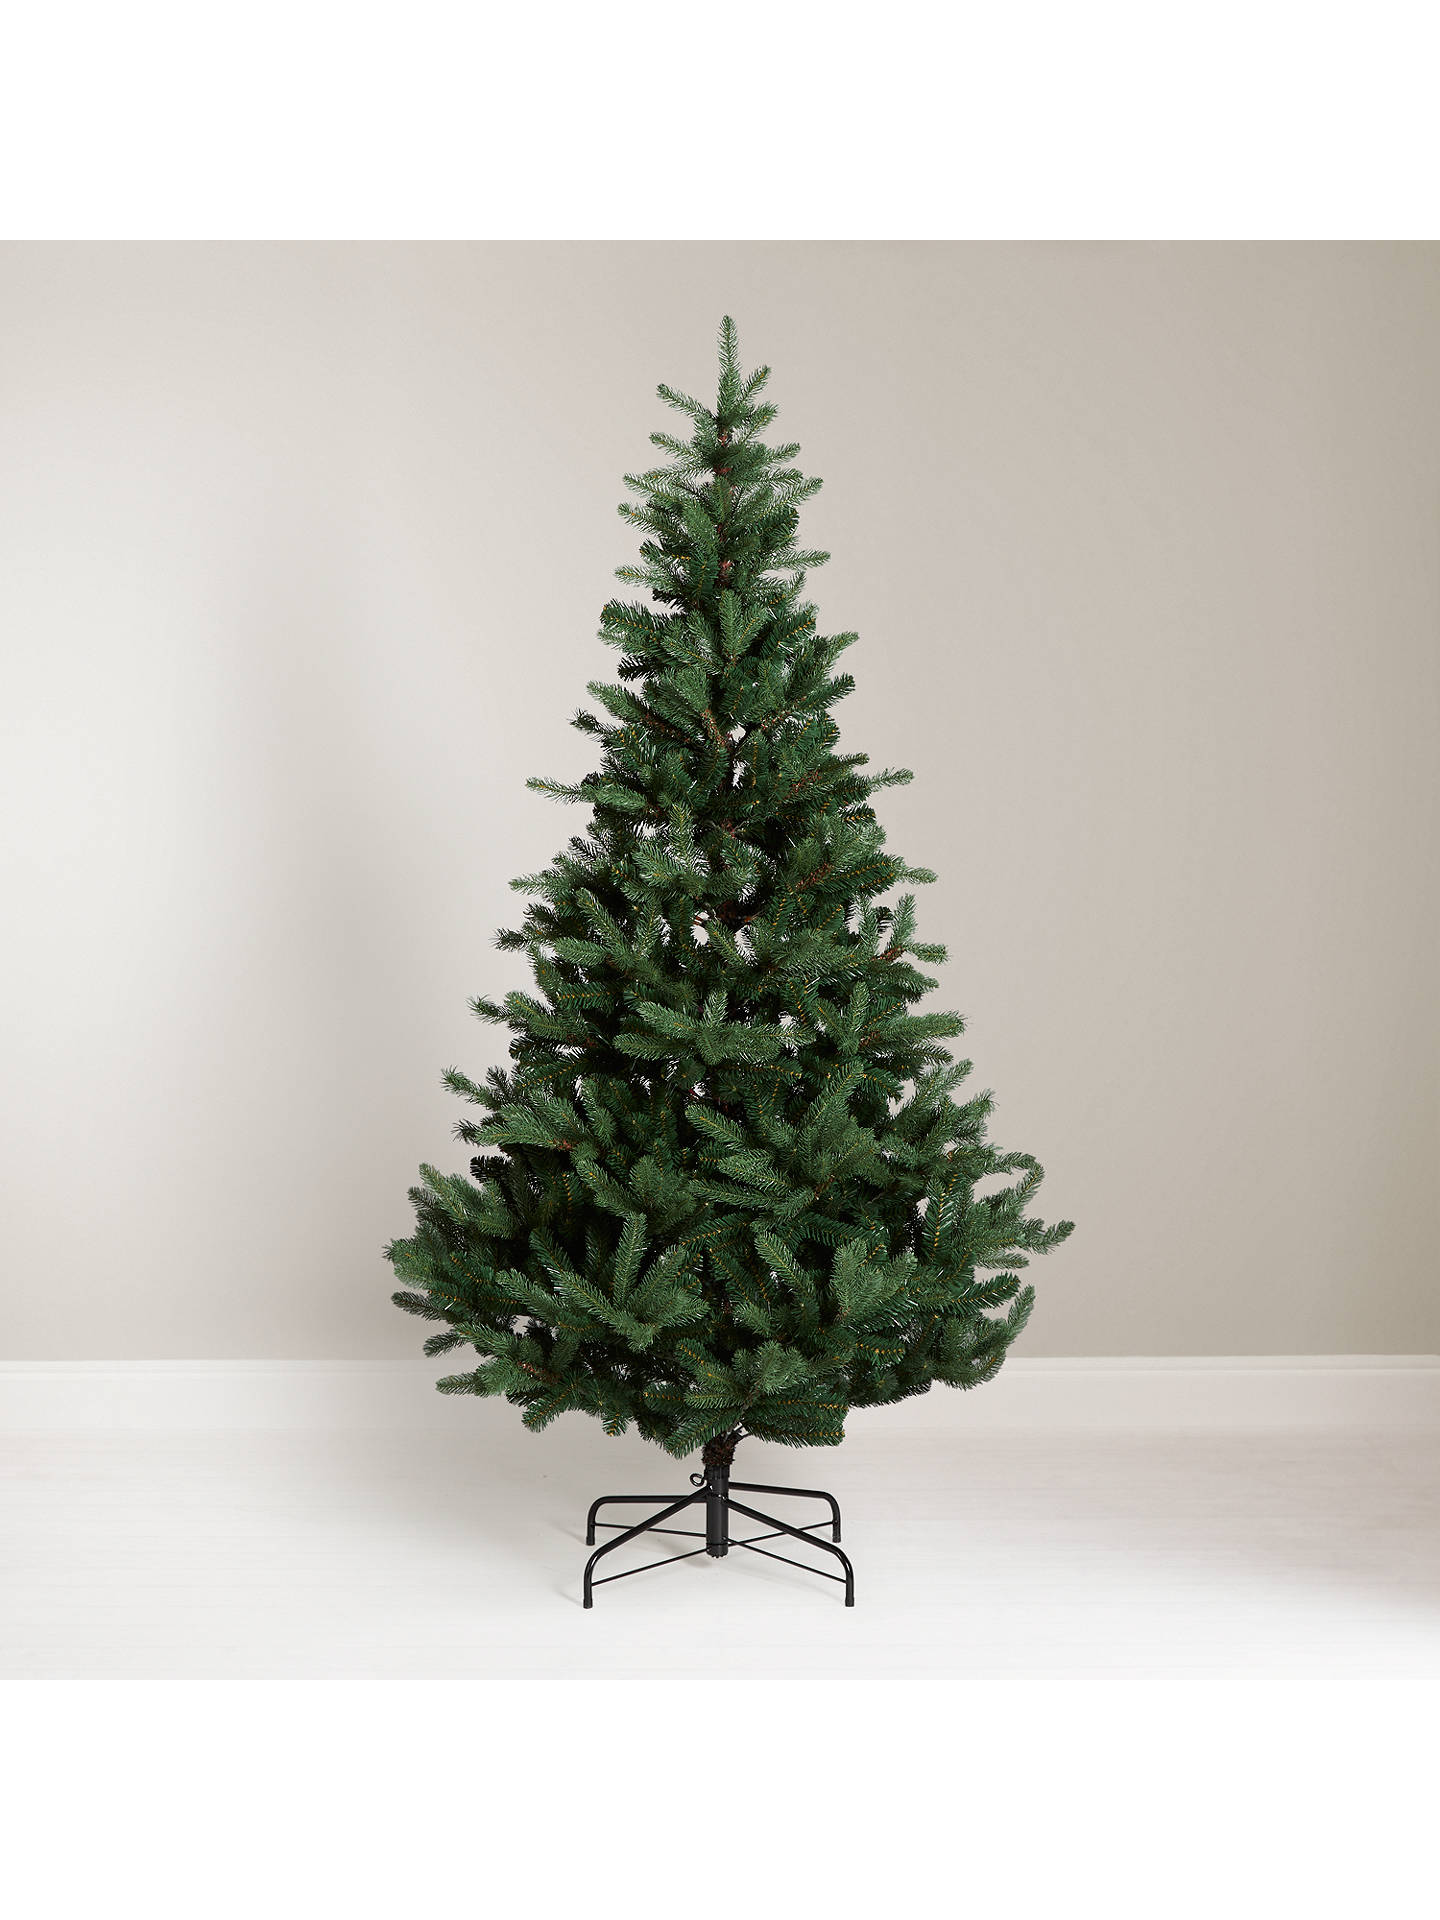 a3f2d6533eb59 Buy John Lewis   Partners Fraser Fir Unlit Christmas Tree